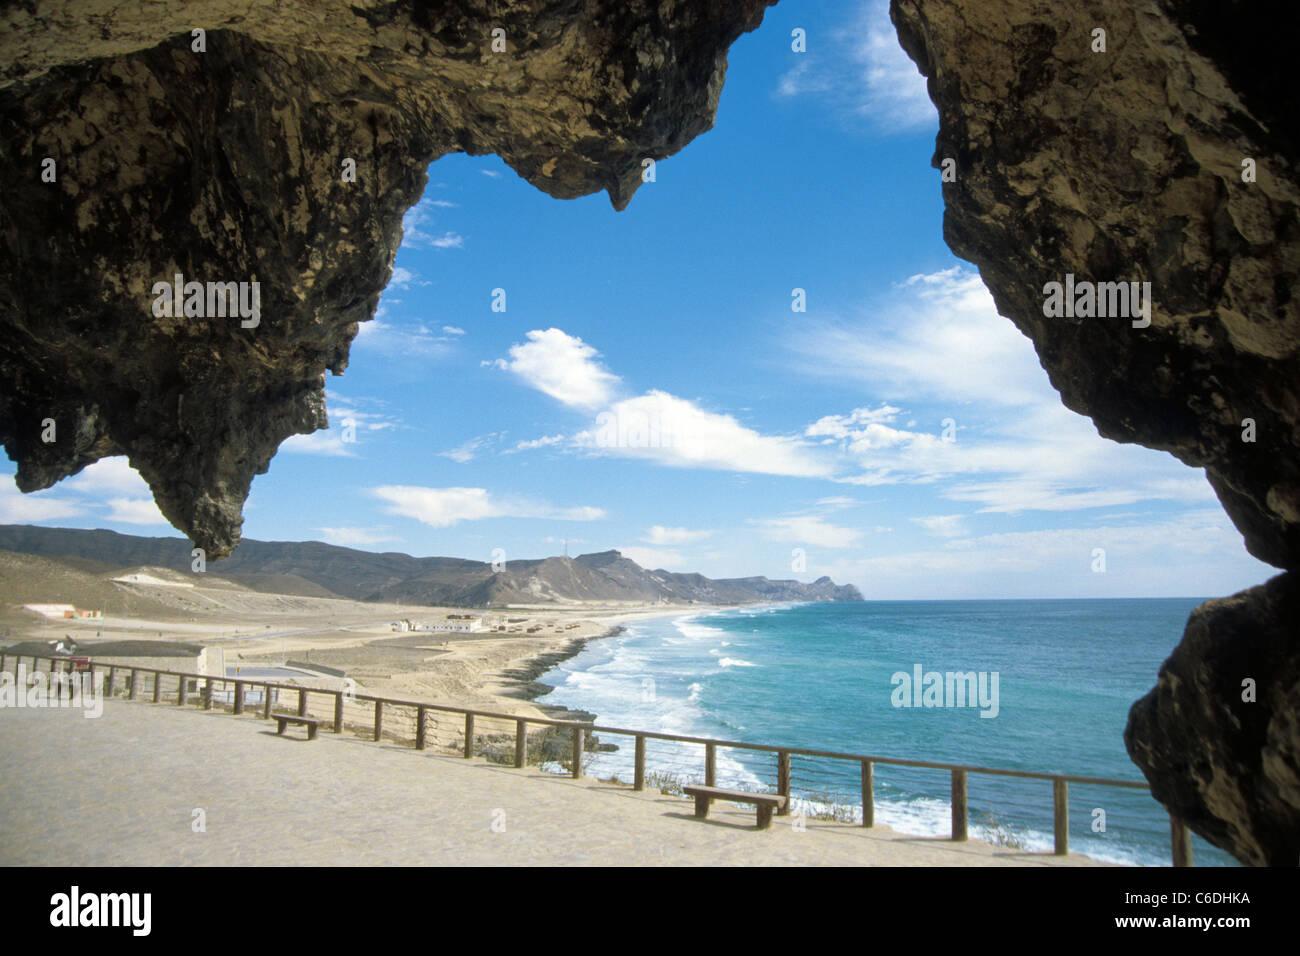 Marnif Hoehle bei der, Al Mughsayl Bay, Salalah, Al Mughsayl Bay, volcanic rock, cave, bay, beach, Salalah - Stock Image